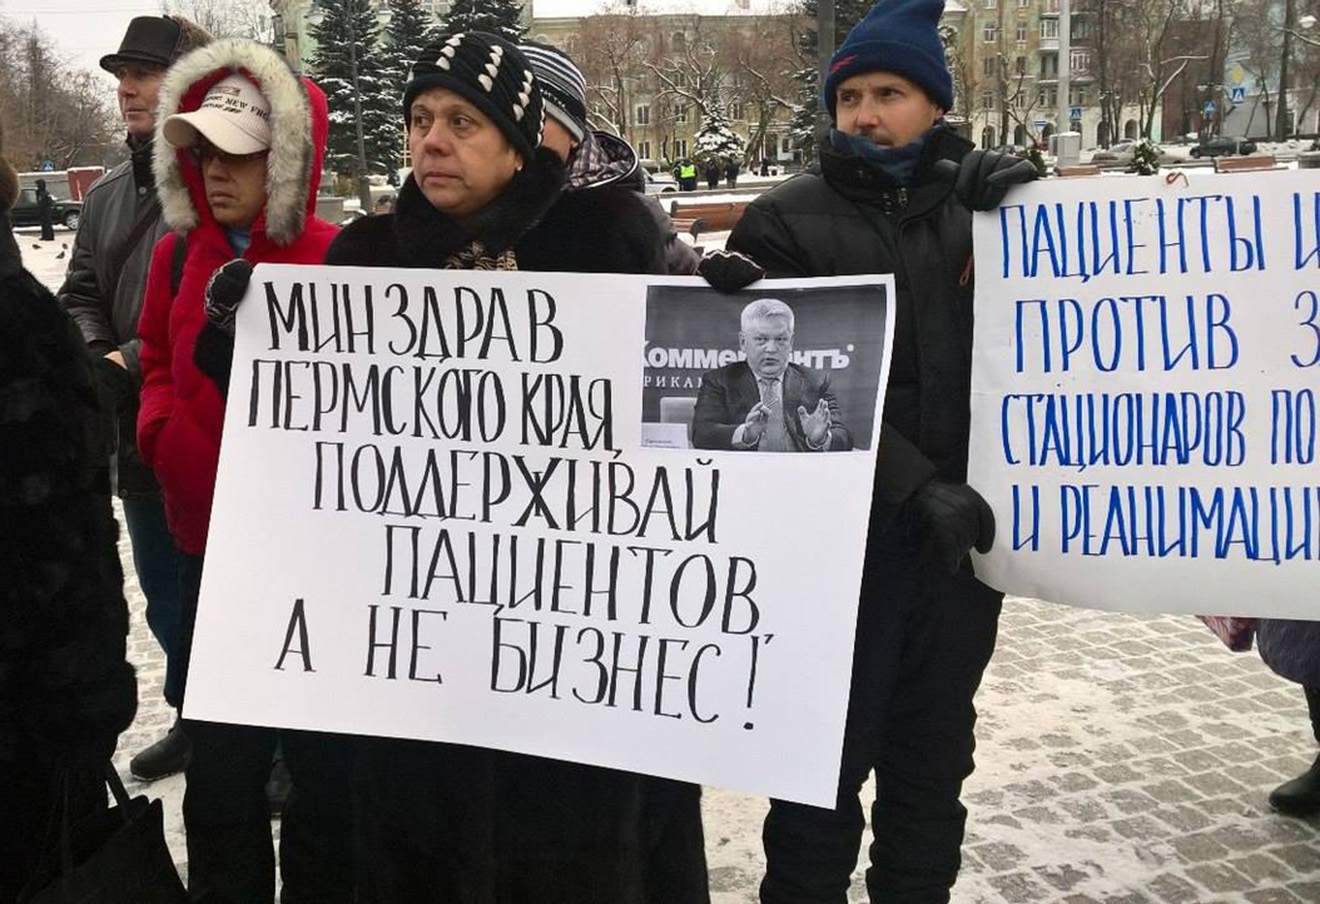 Фото: Александр Золотарев